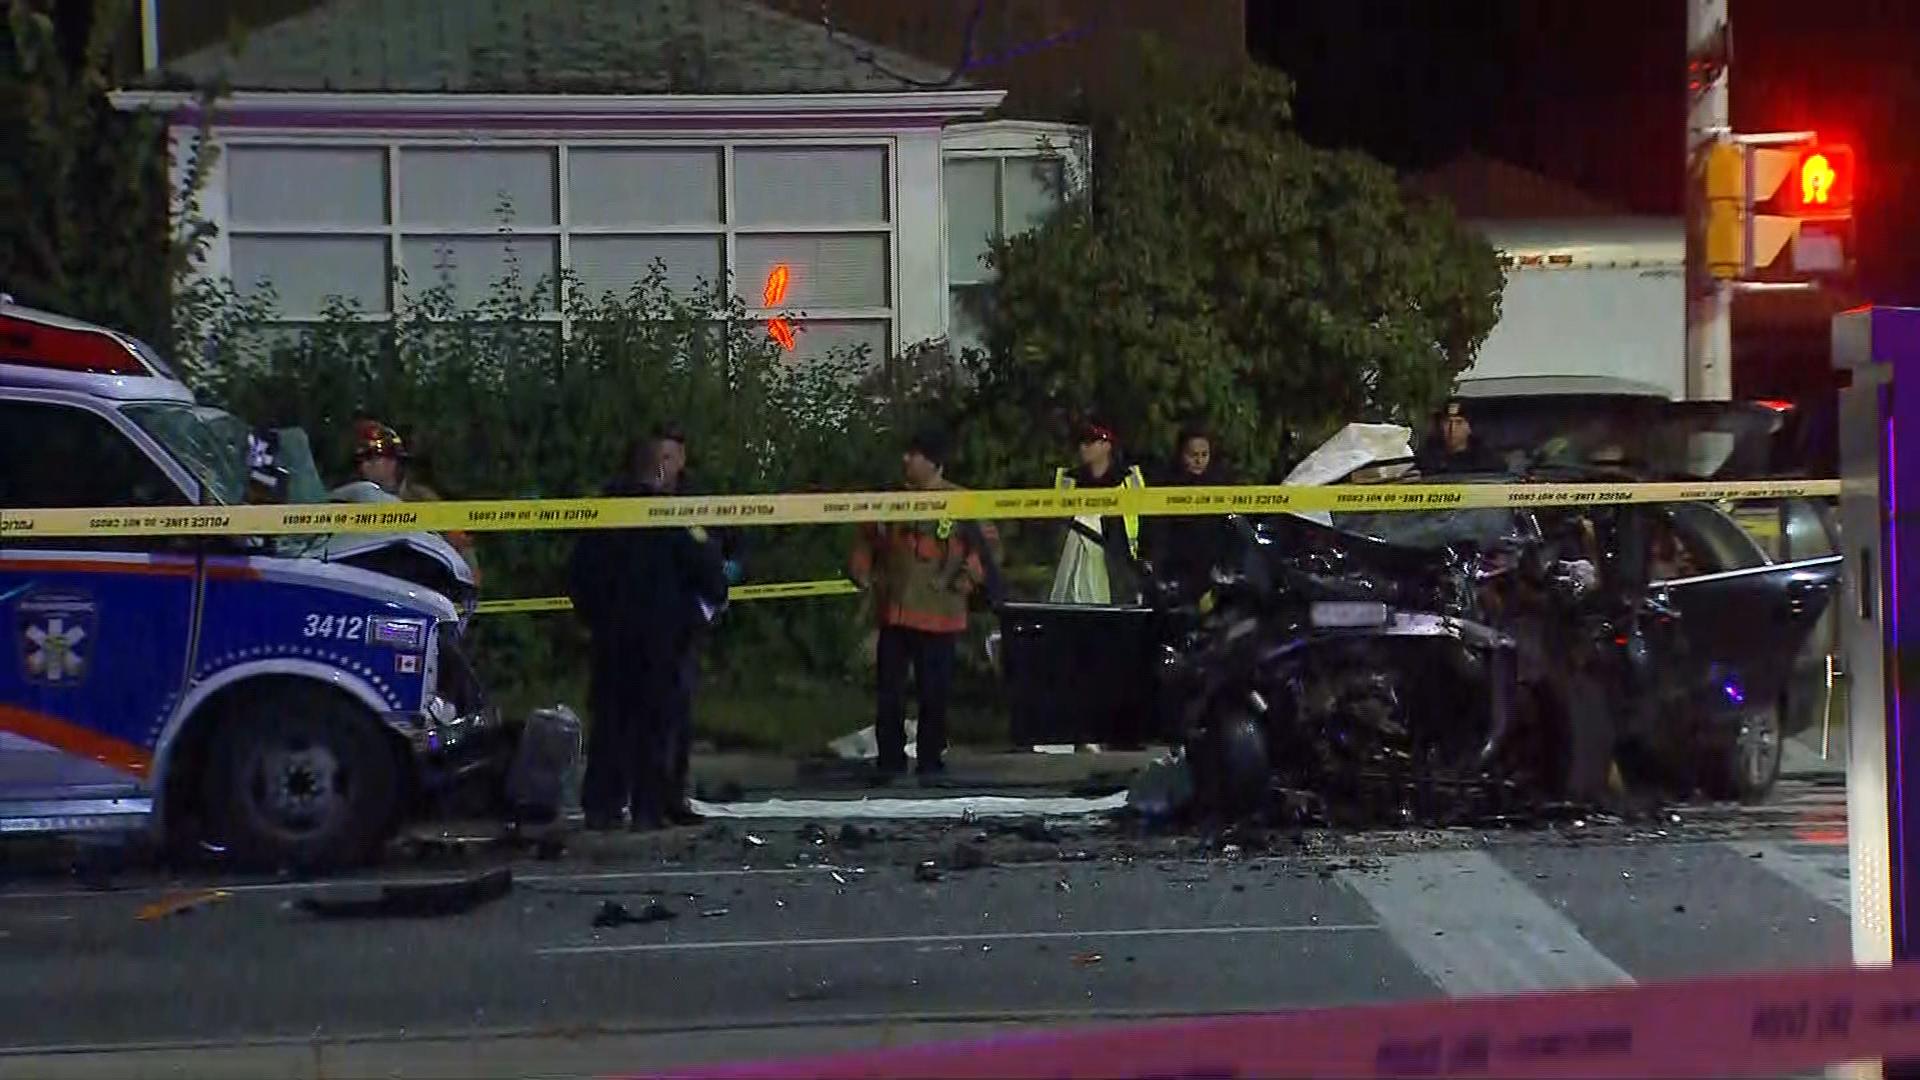 1 dead in 2-vehicle crash involving ambulance in brampton